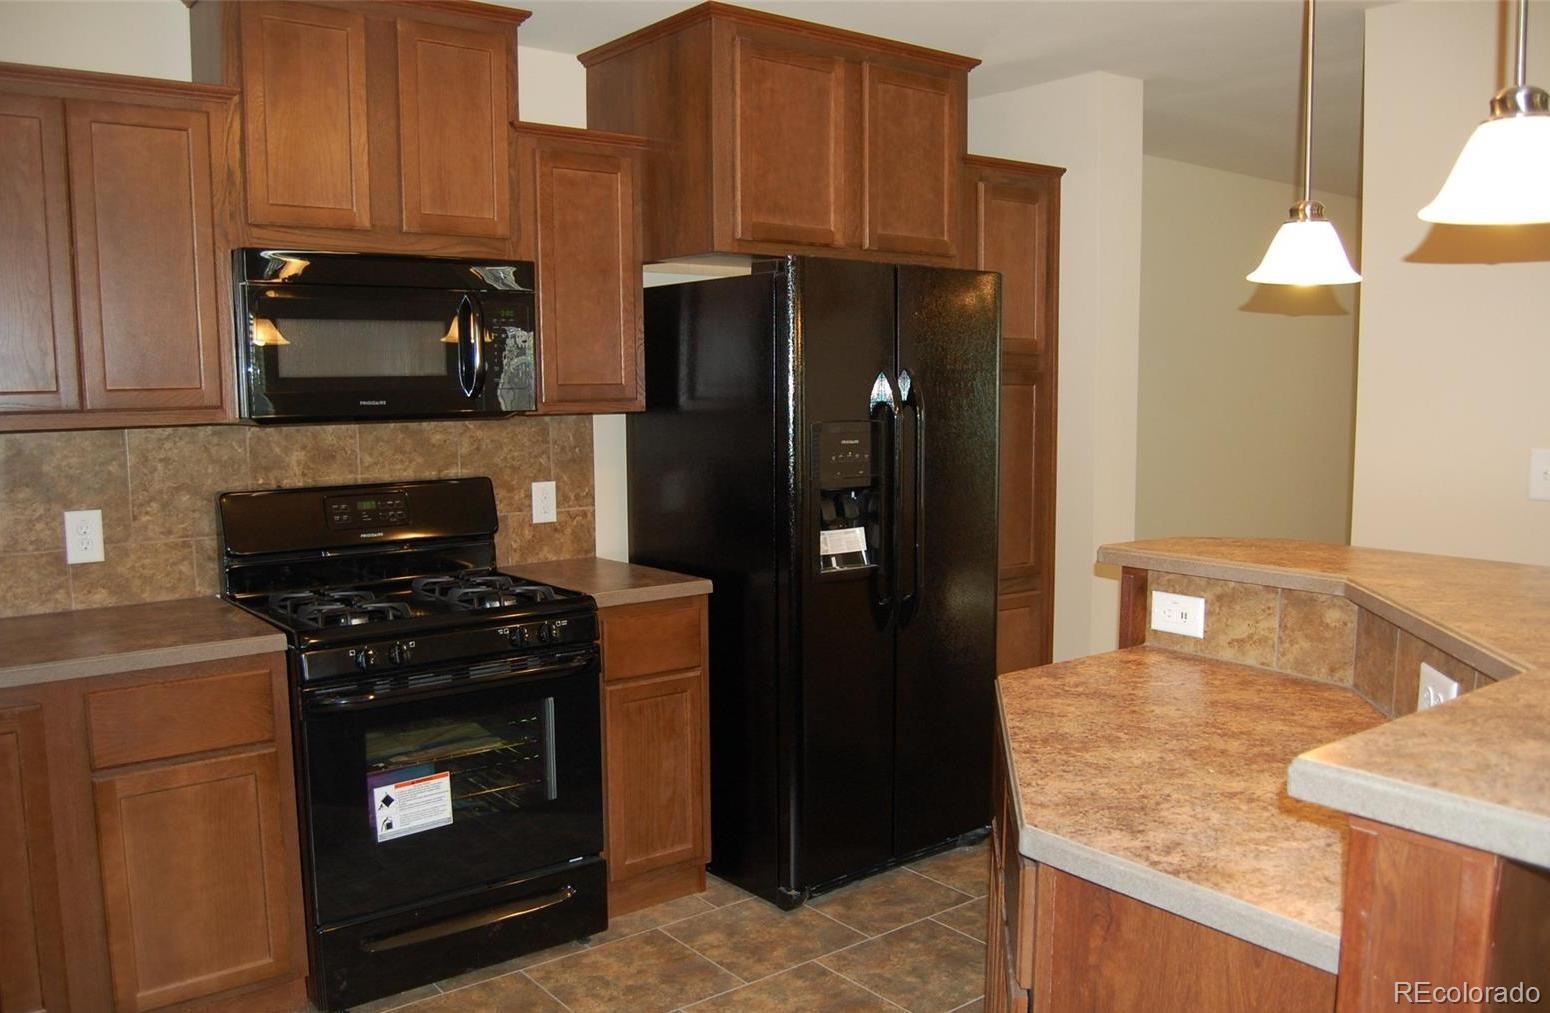 MLS# 9171580 - 6 - 426 Cheyenne Street, Kiowa, CO 80117